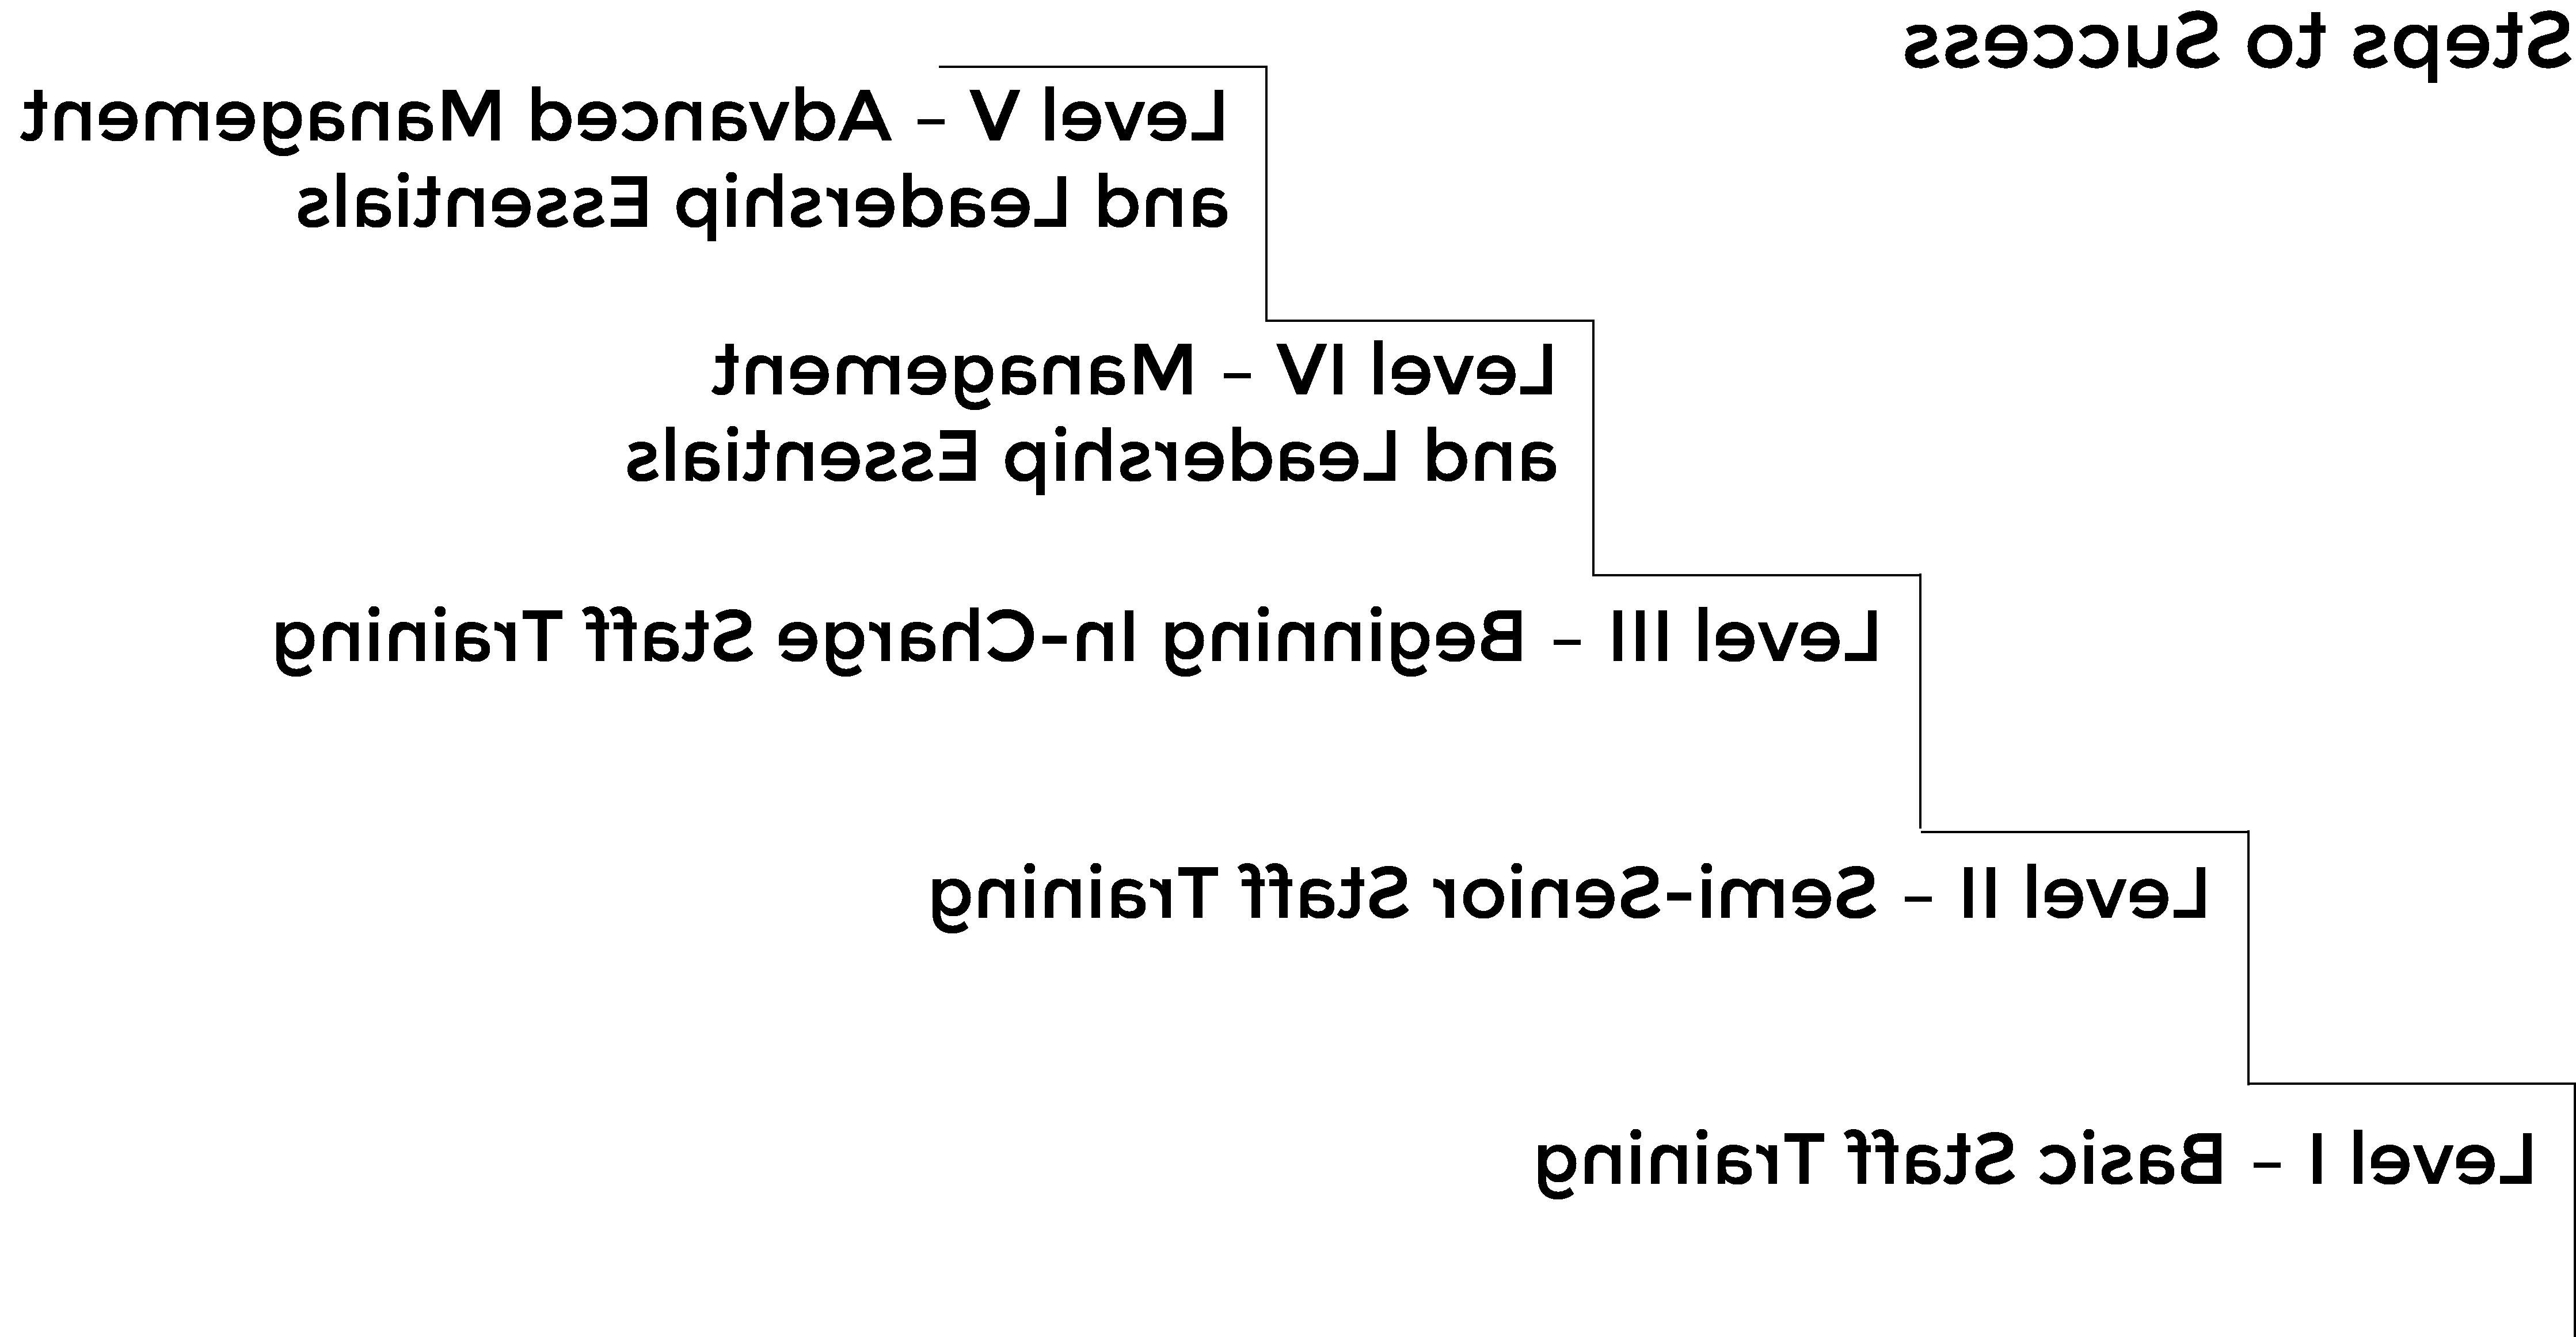 AHI步骤Success_03-11-2021